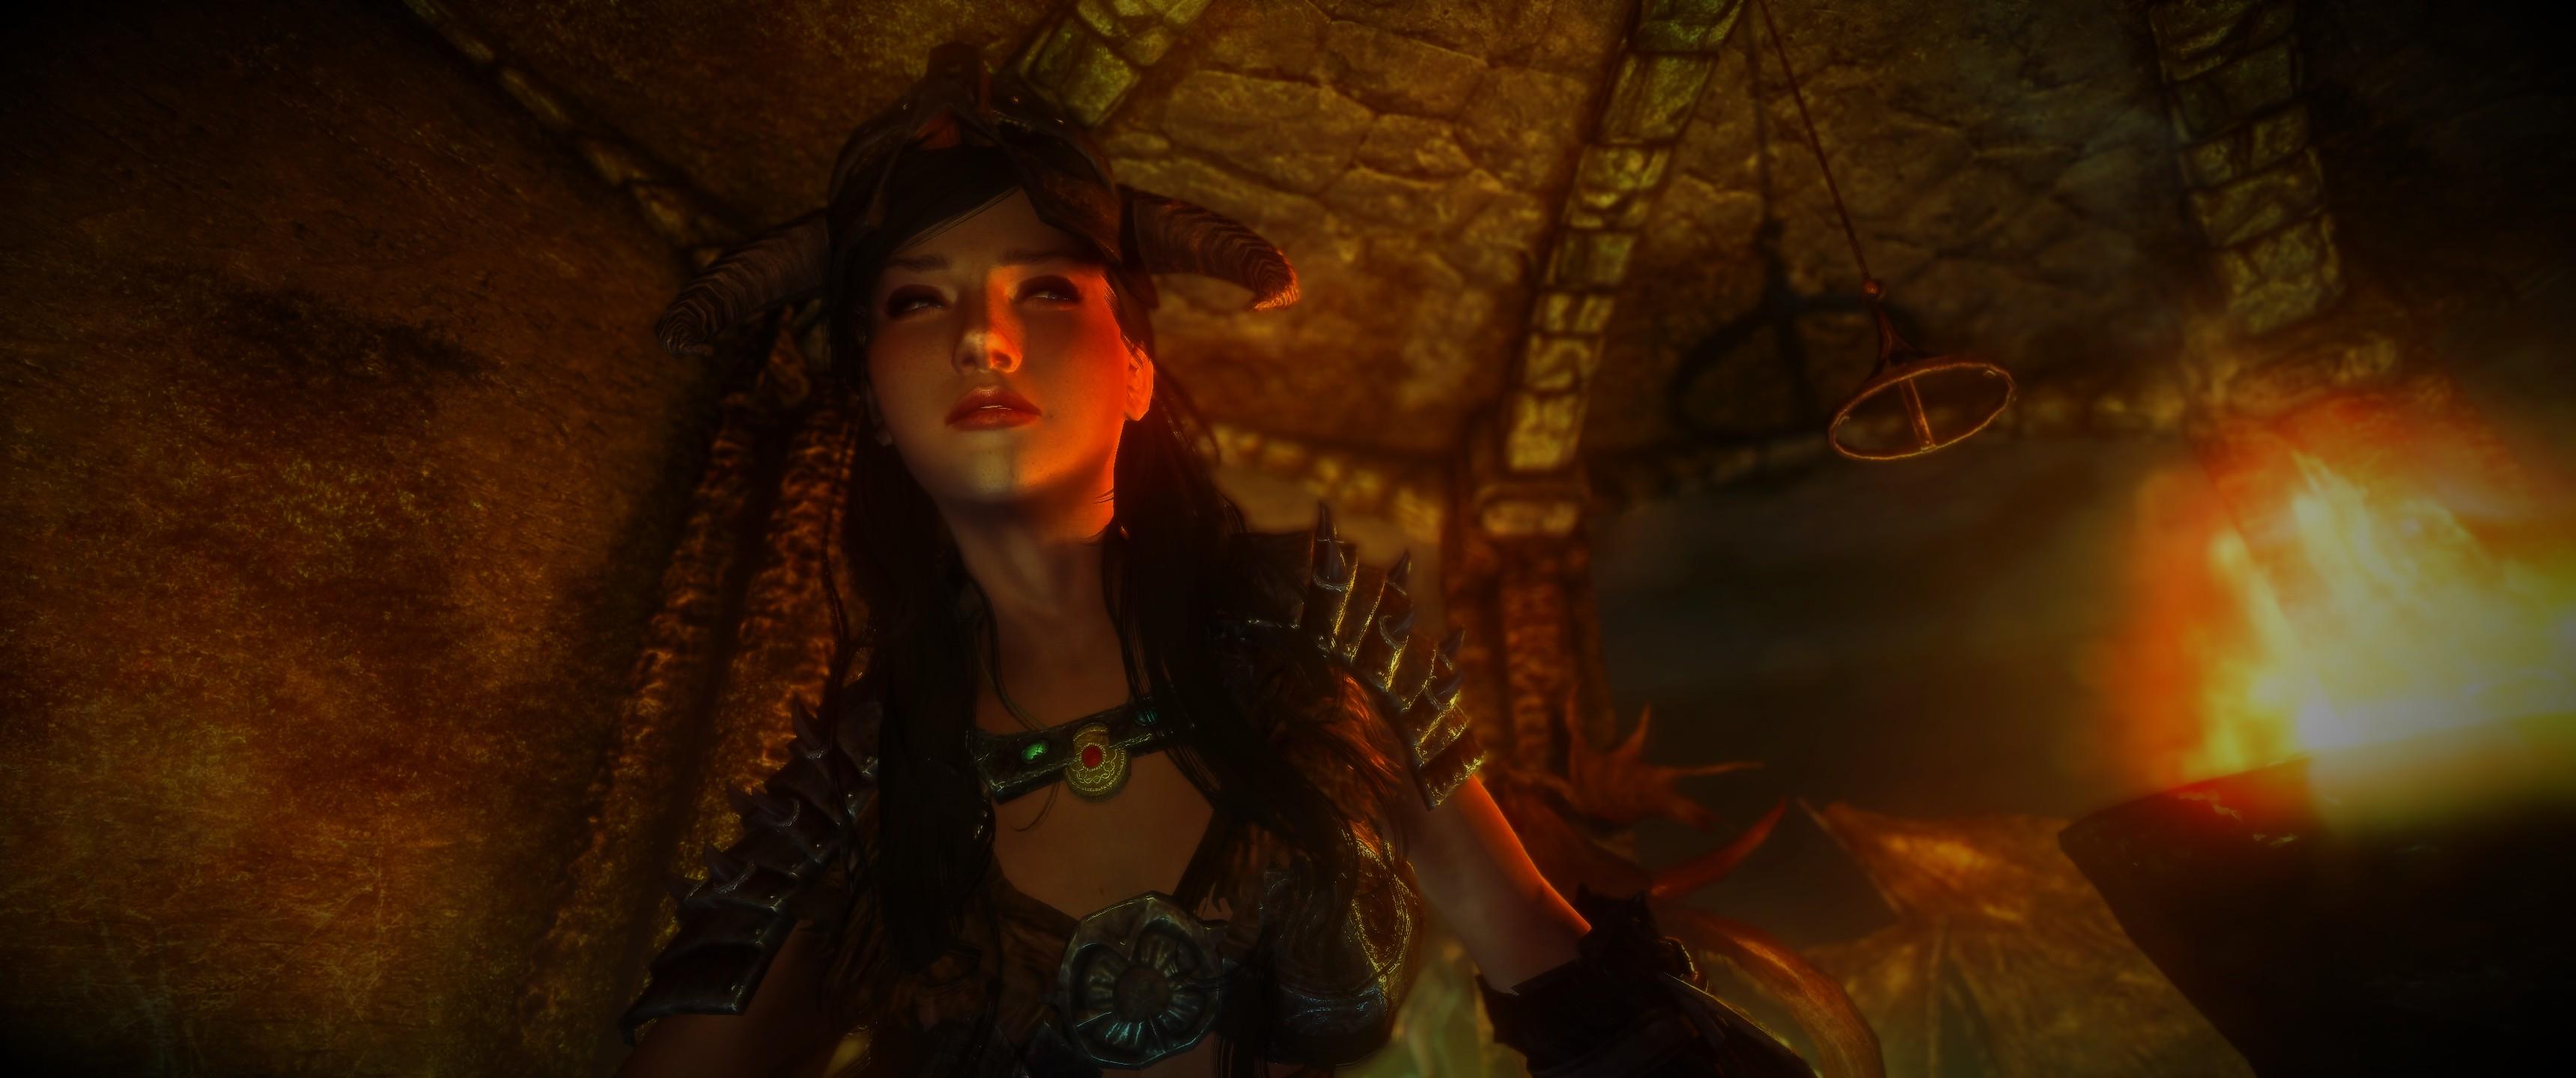 20171217081132_1.jpg - Elder Scrolls 5: Skyrim, the